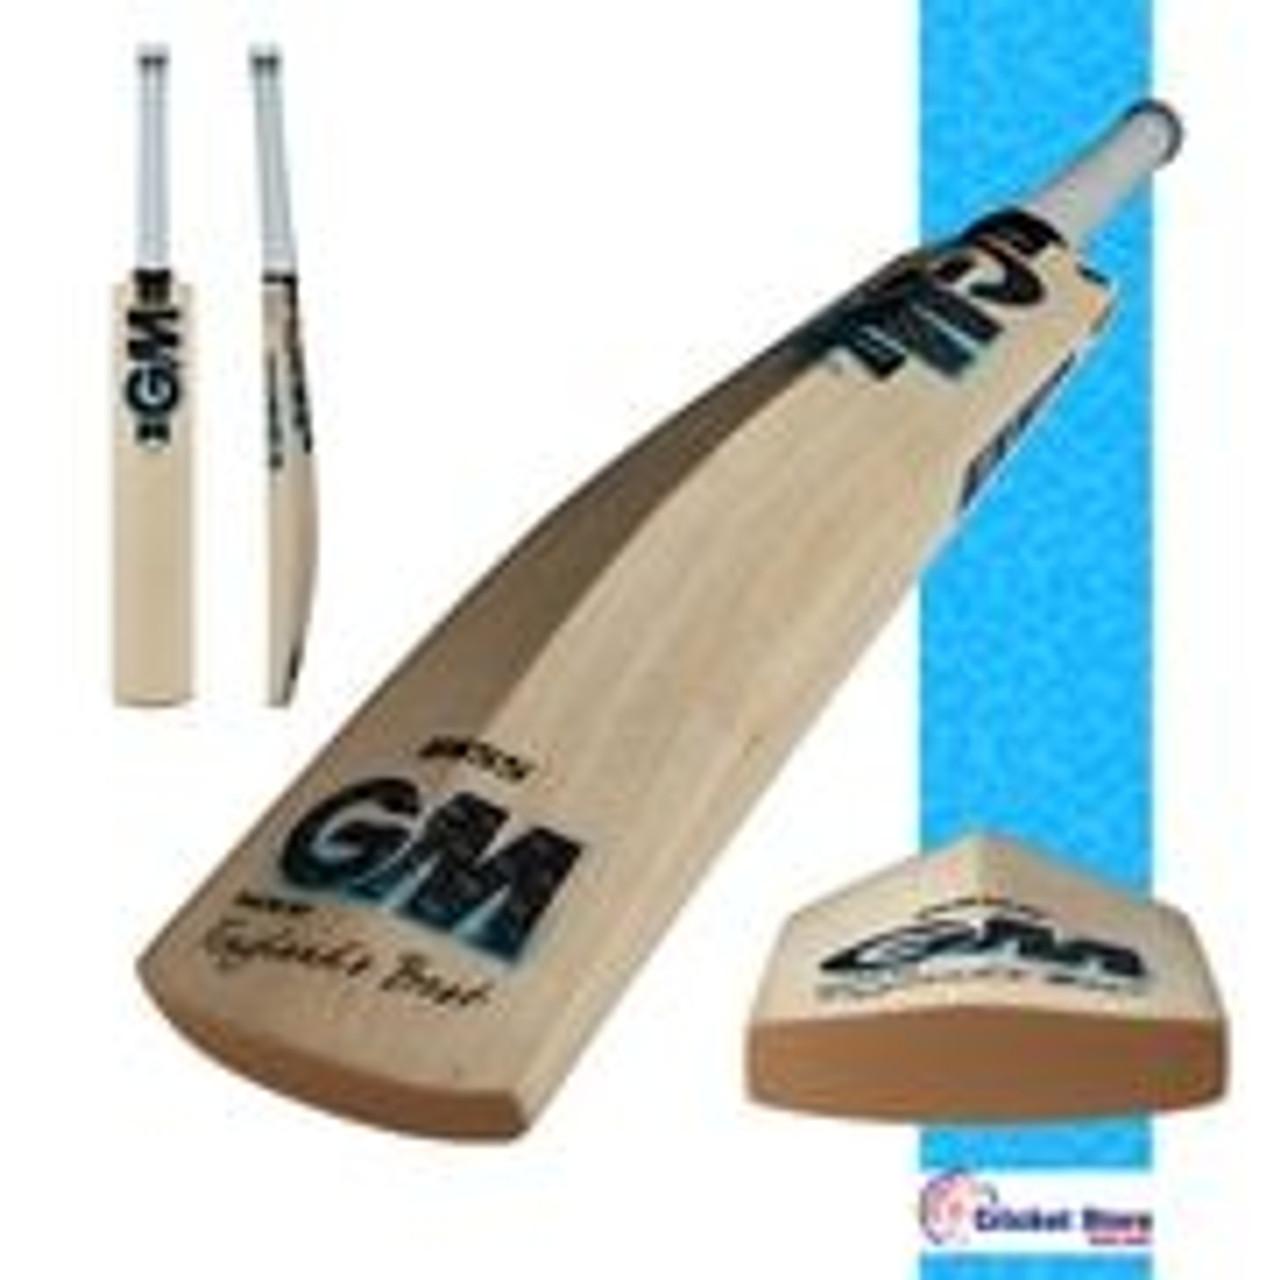 GM HAZE Cricket Bat